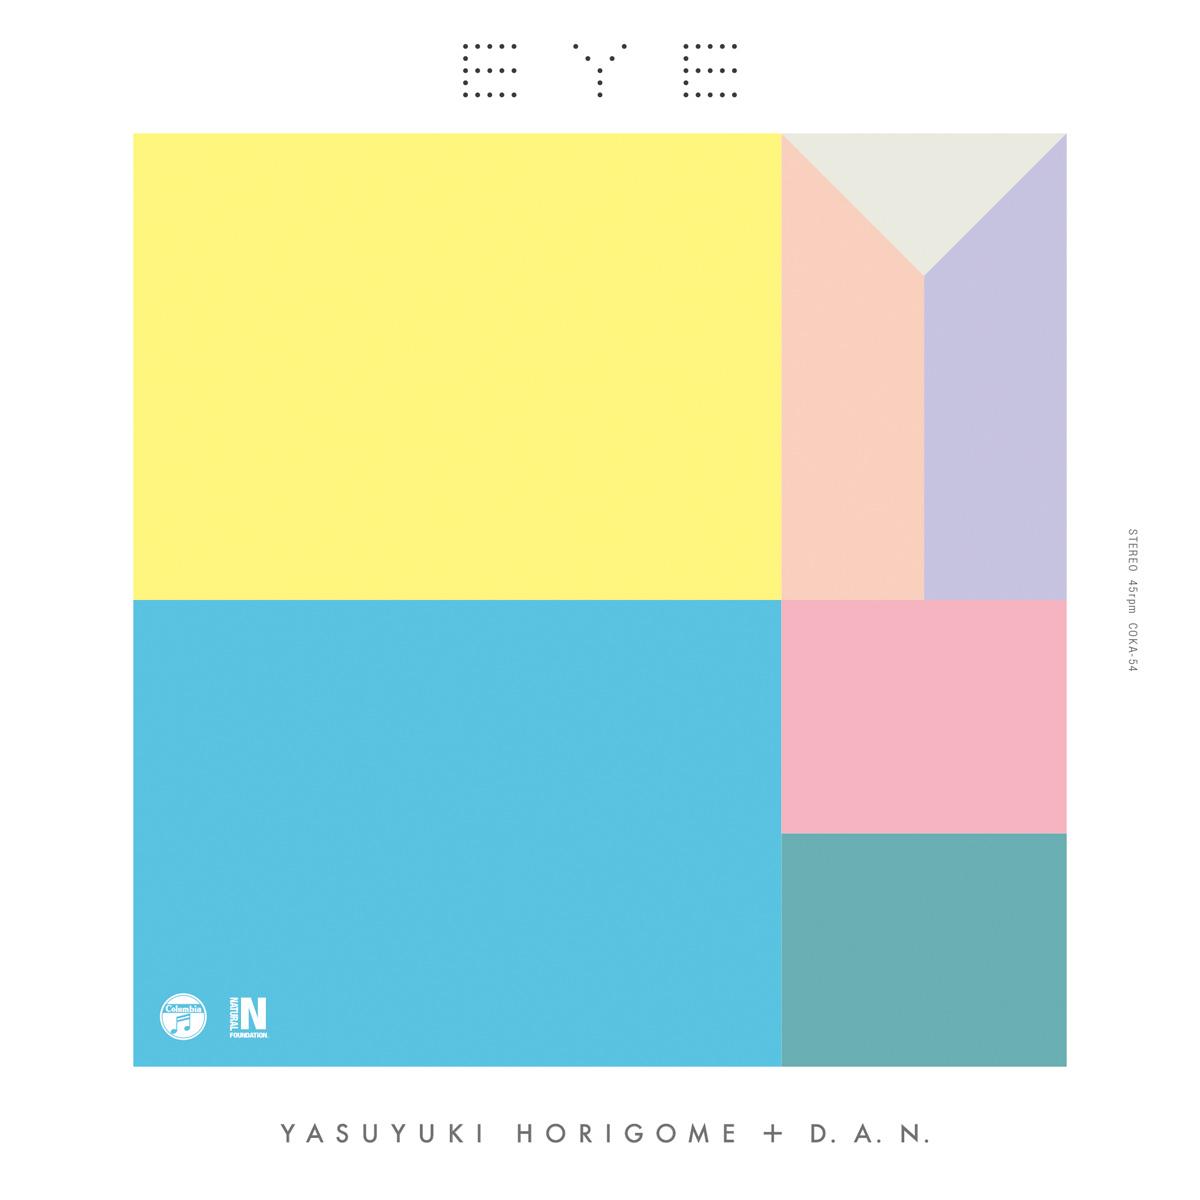 7inch 「EYE」/ YASUYUKI HORIGOME + D.A.N.